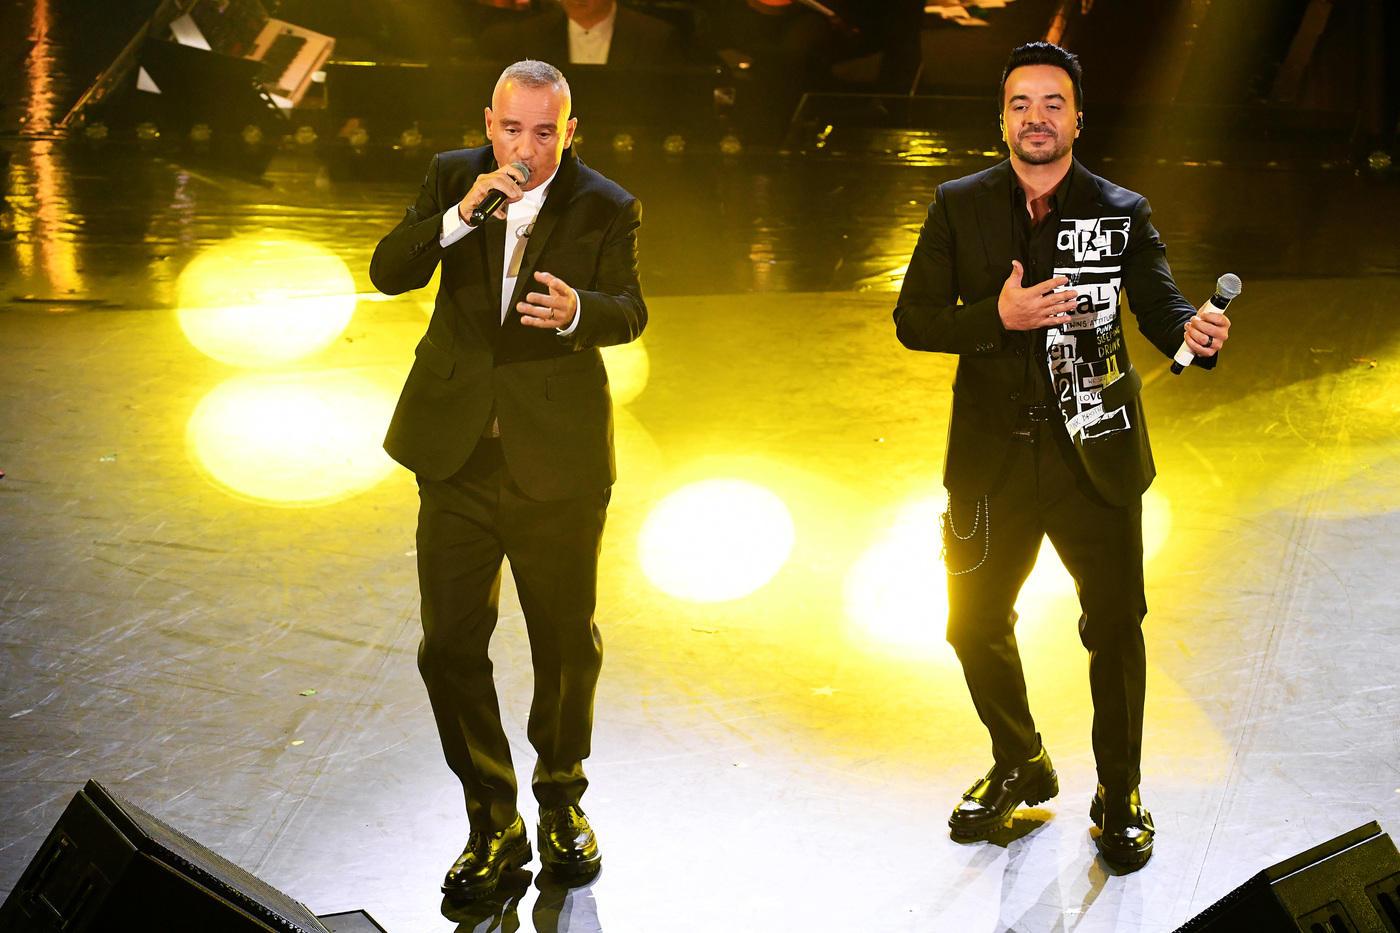 Sanremo 2019, Eros Ramazzotti duetta con Luis Fonsi